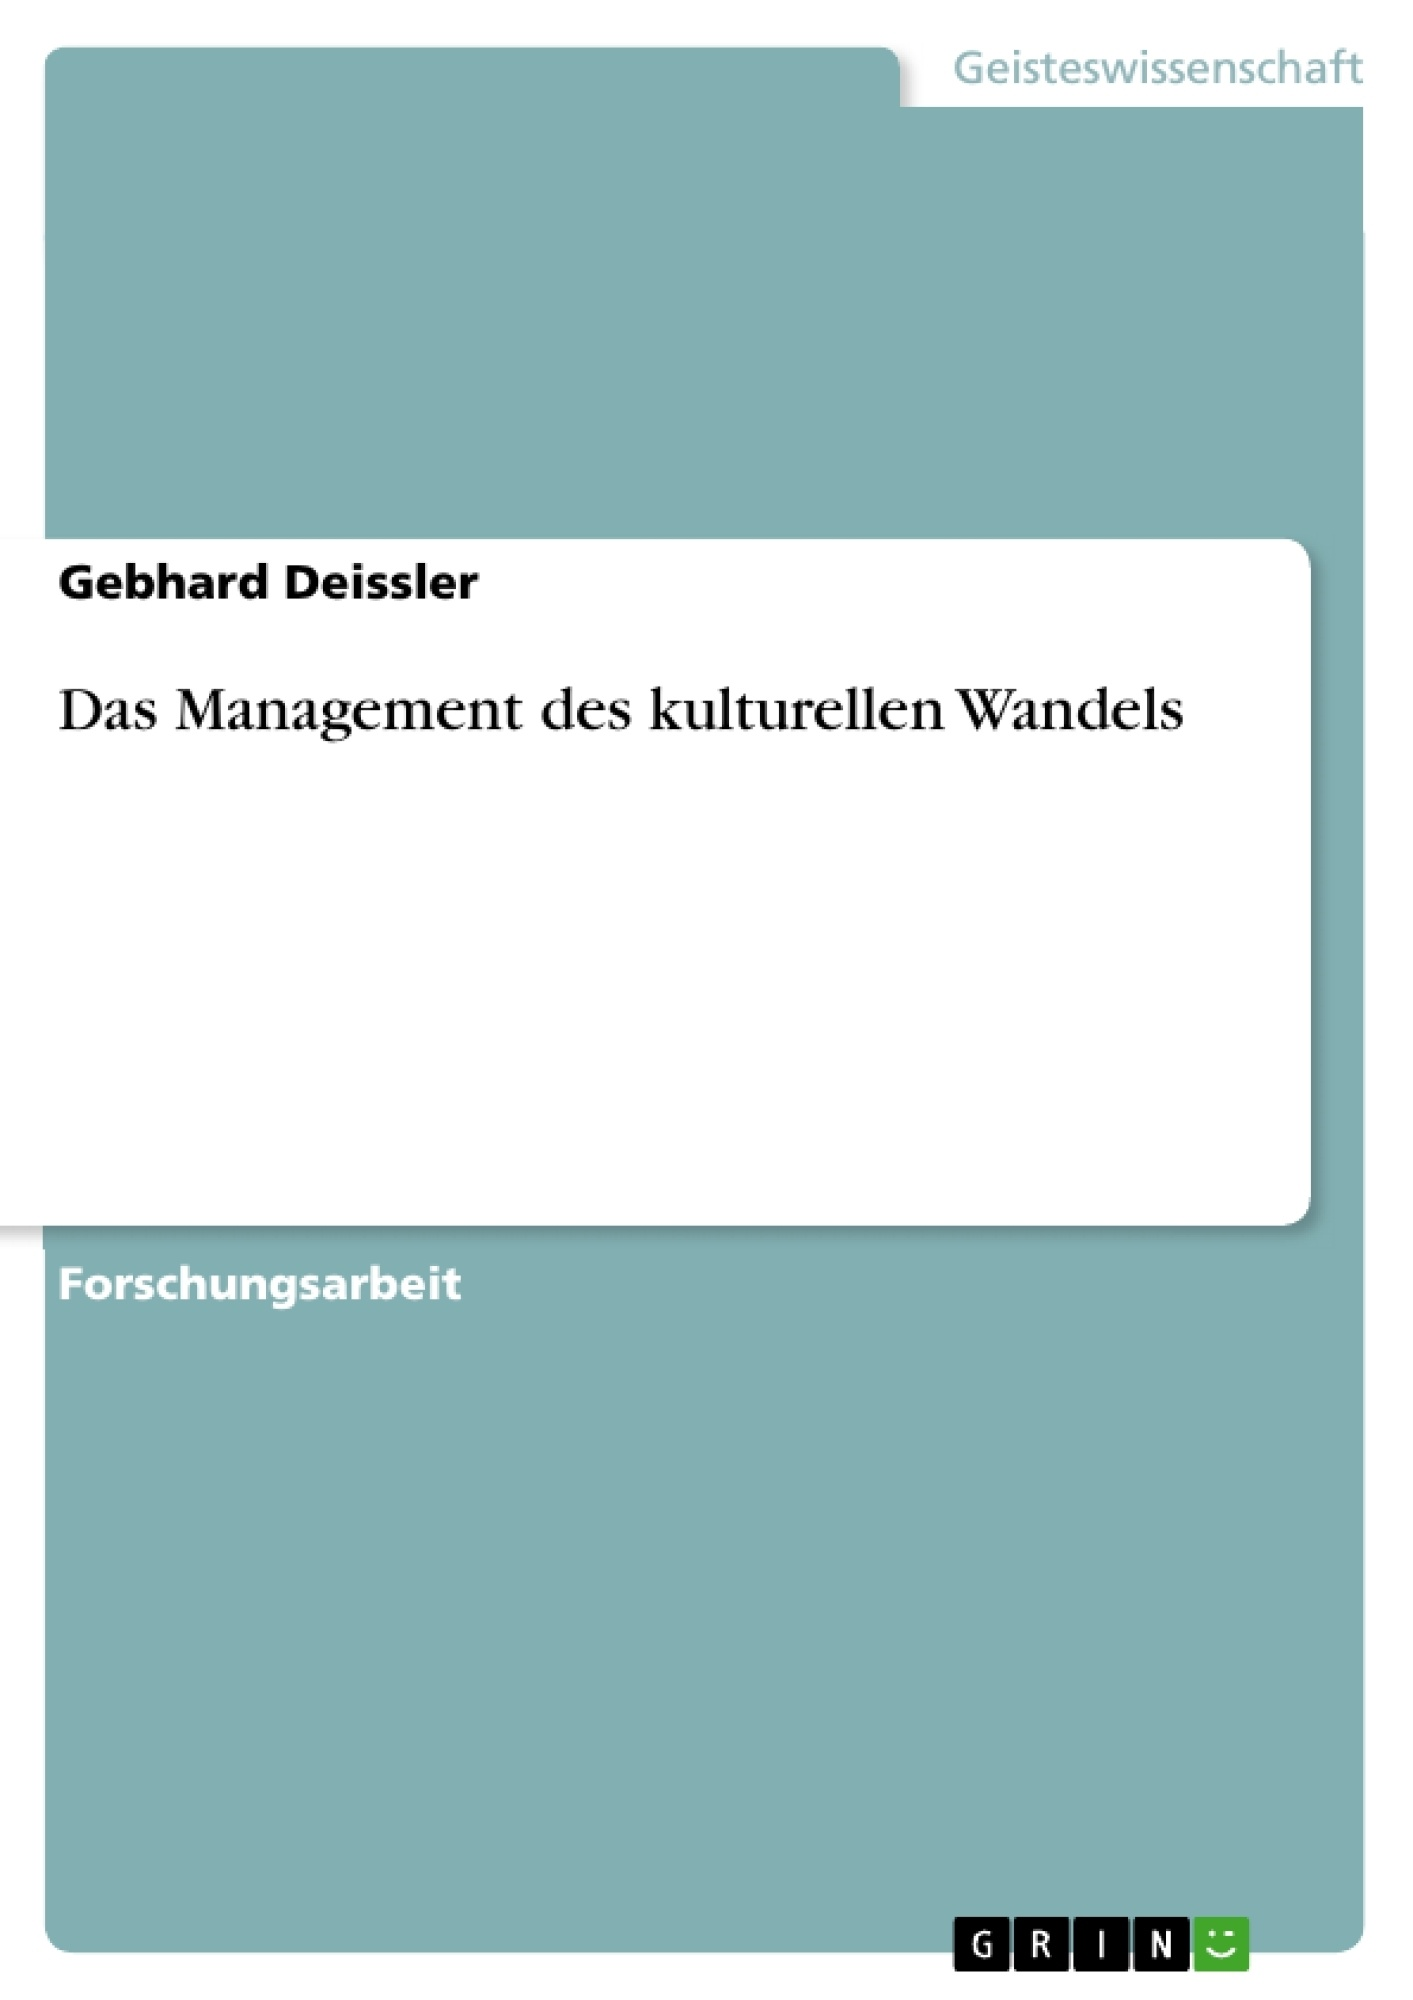 Titel: Das Management des kulturellen Wandels